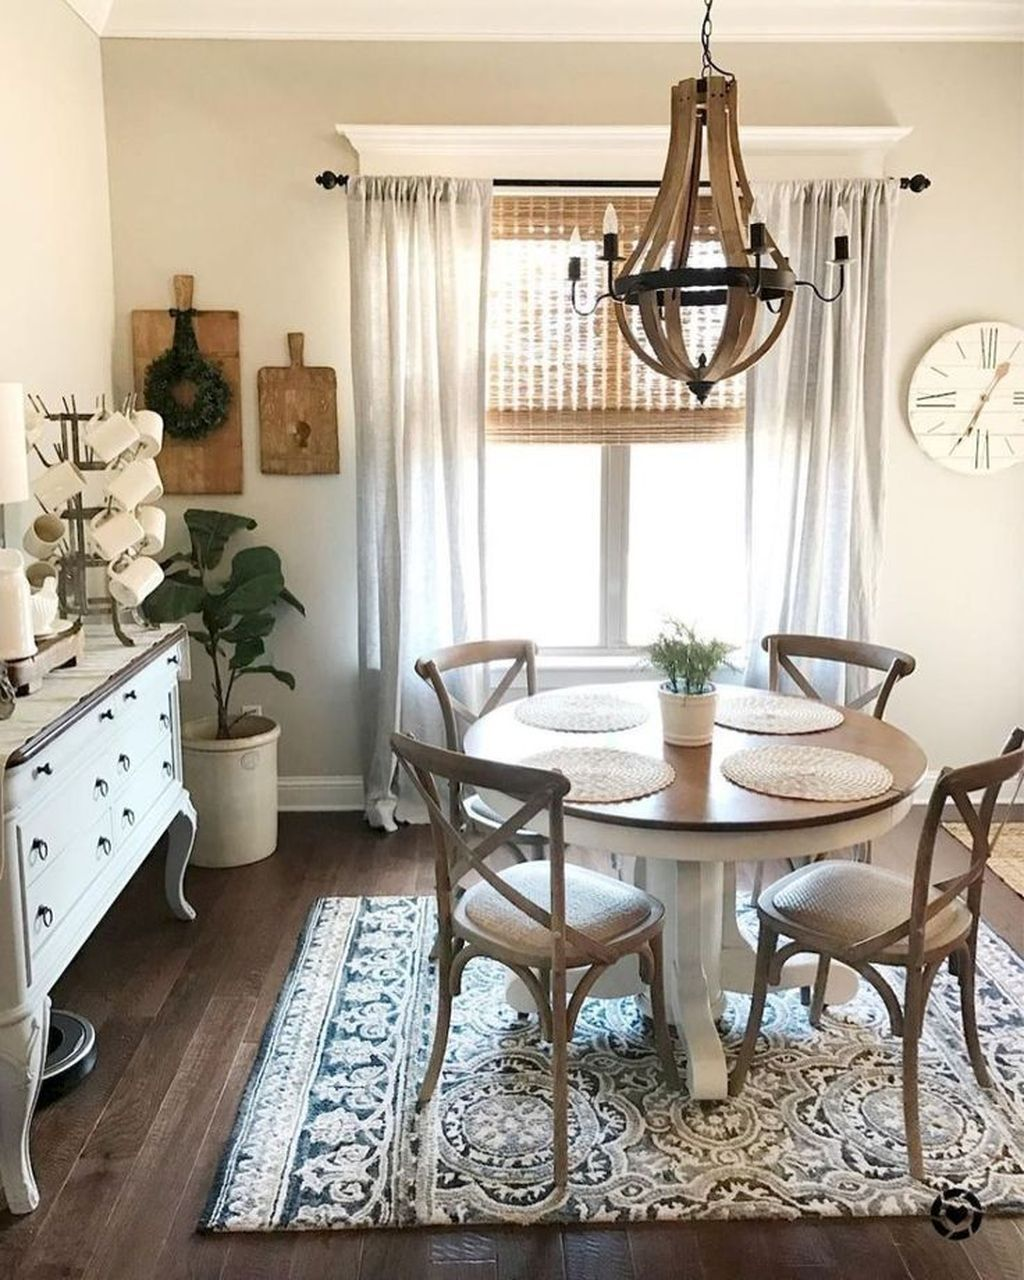 50 Amazing Rustic Dining Room Design Ideas Modern Farmhouse